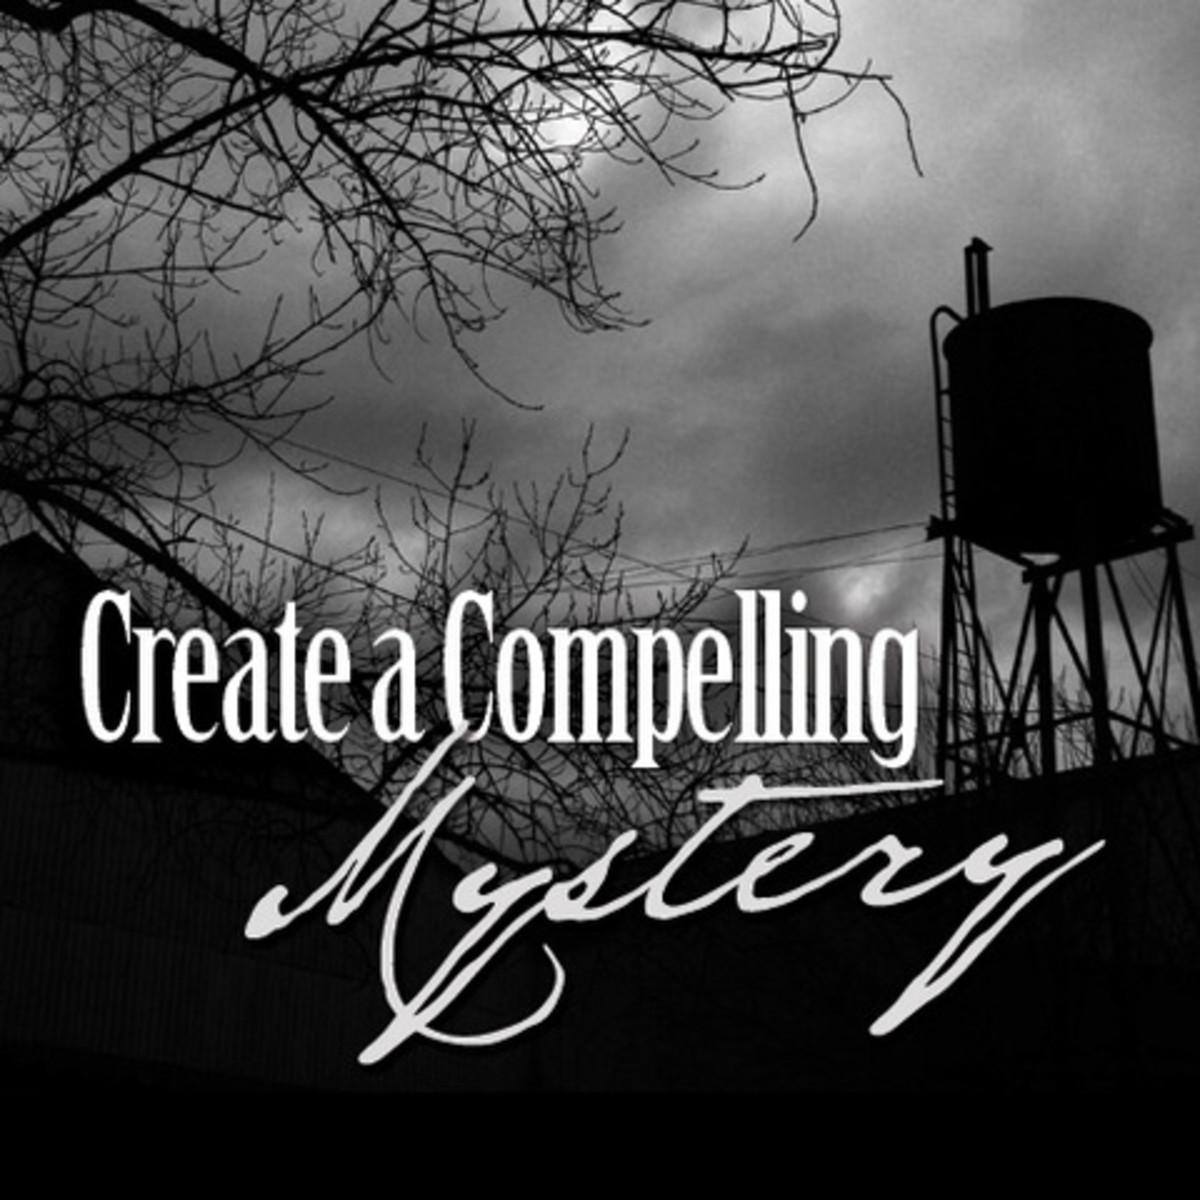 500_compelling mystery_medium